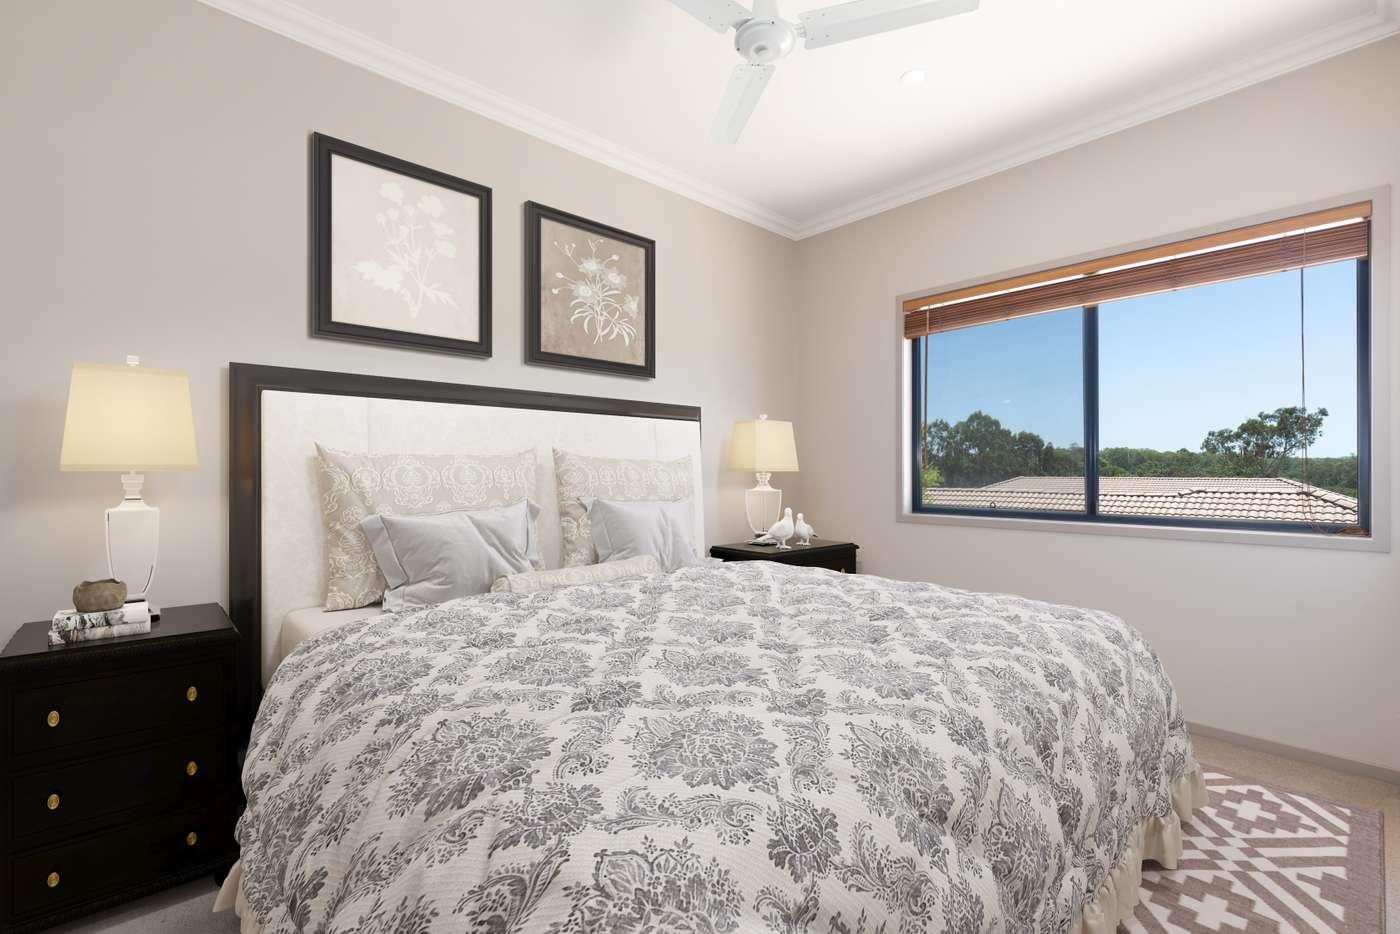 Fifth view of Homely villa listing, 14/119 Sugarwood Street, Moggill QLD 4070